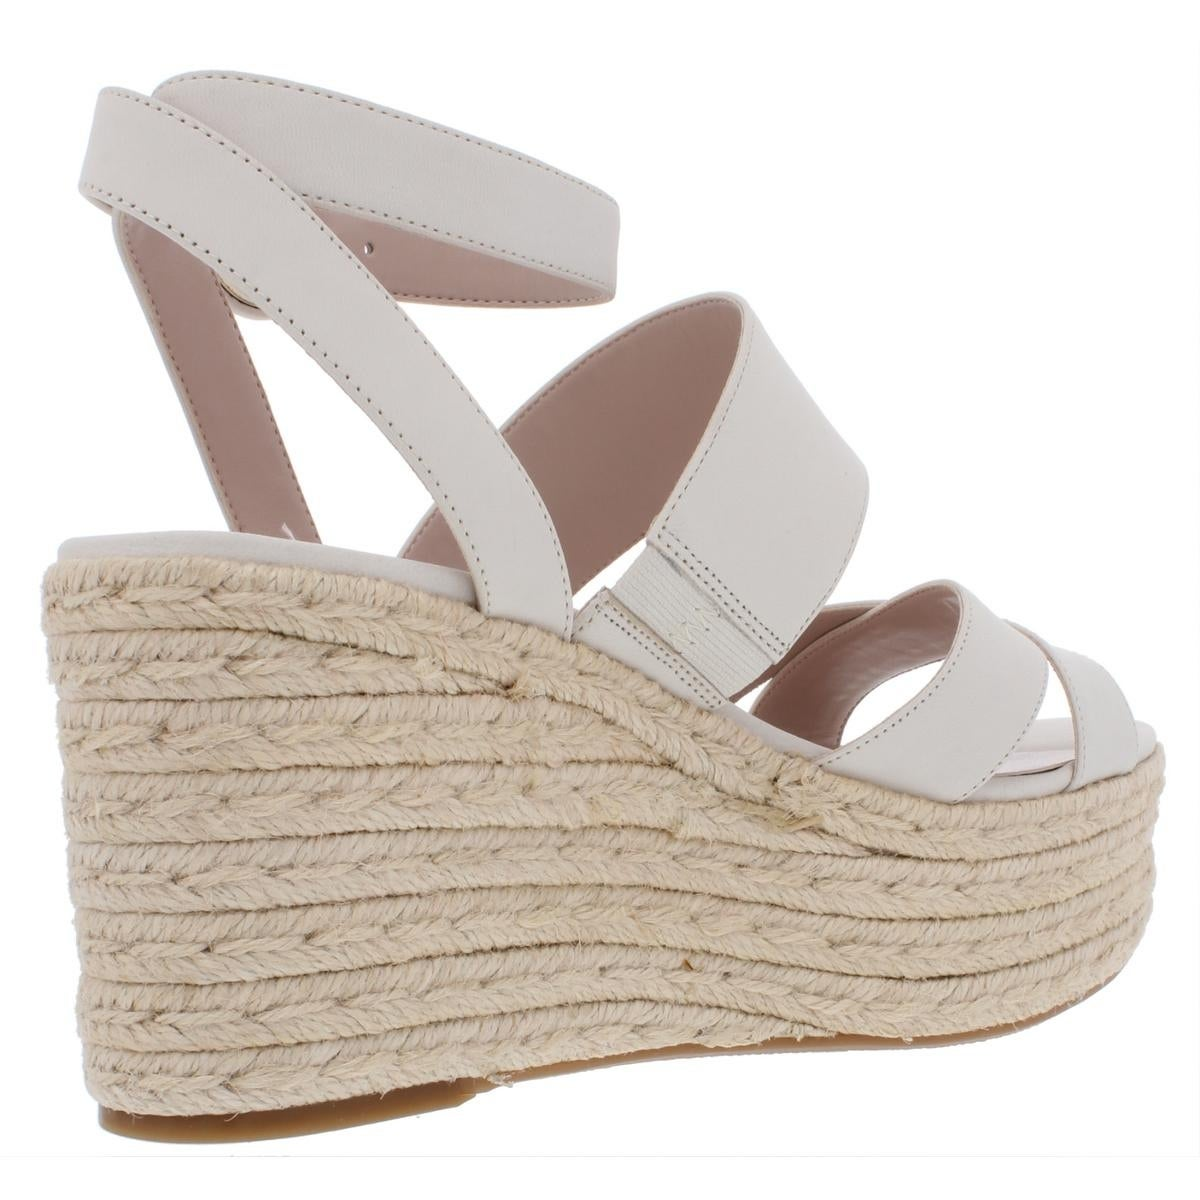 8c6c8c32aa31 Shop Nine West Womens Kushala Wedge Sandals Nubuck Espadrille - Free  Shipping On Orders Over  45 - Overstock - 27588967